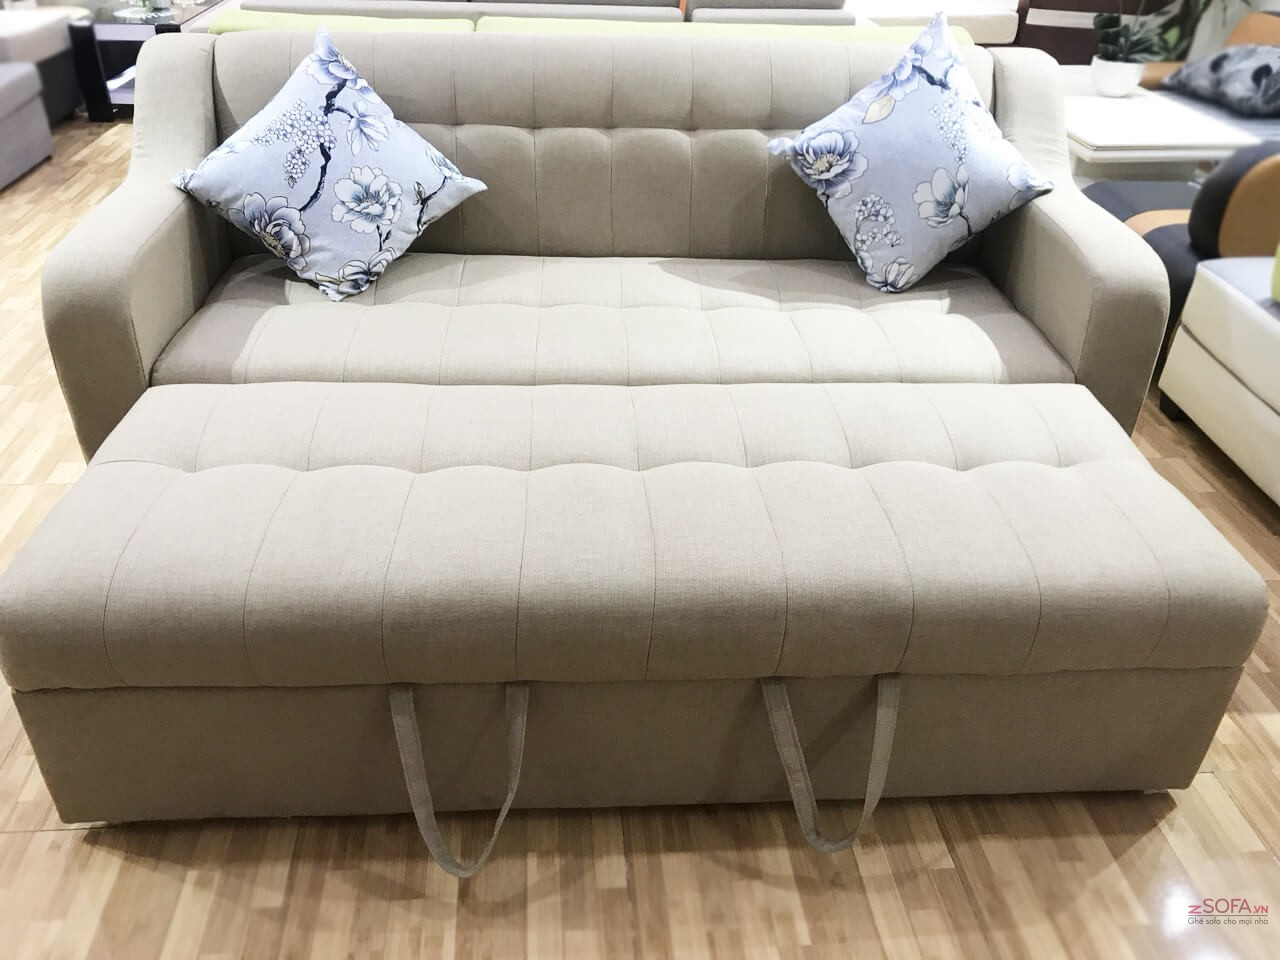 sofa-da-nang-hien-dai